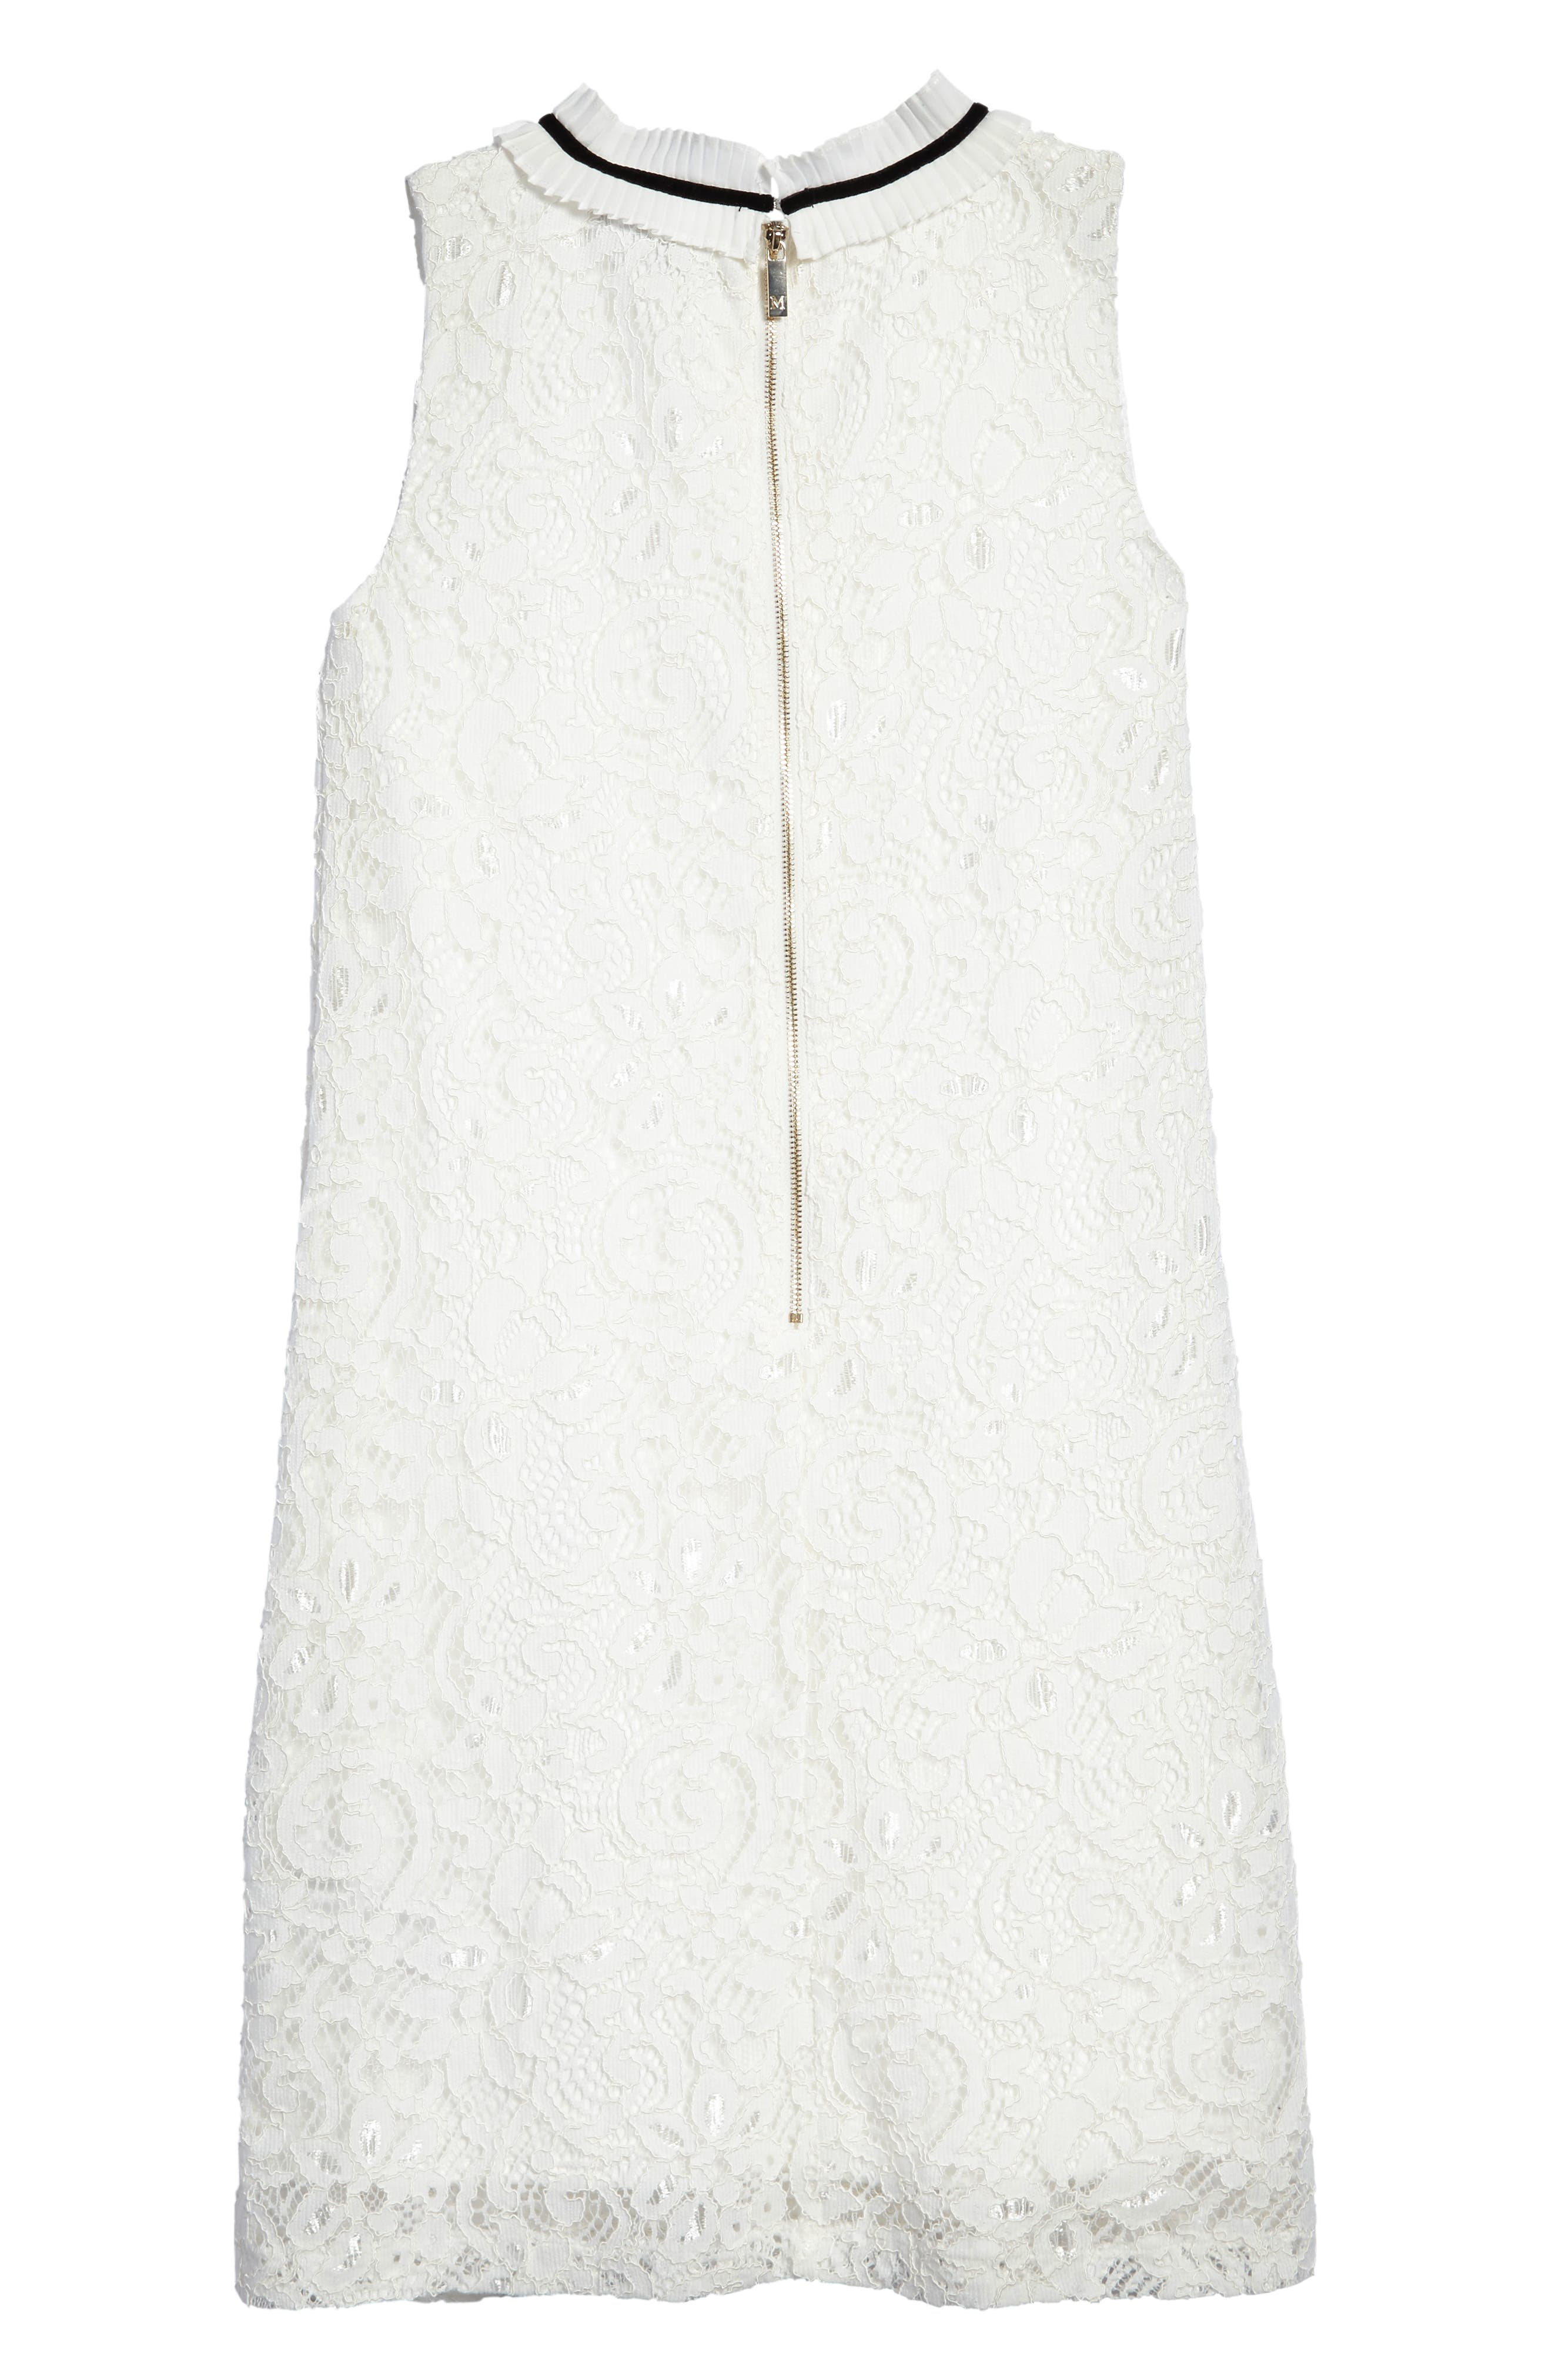 Alternate Image 2  - Marciano Sleeveless Lace Dress (Big Girls)